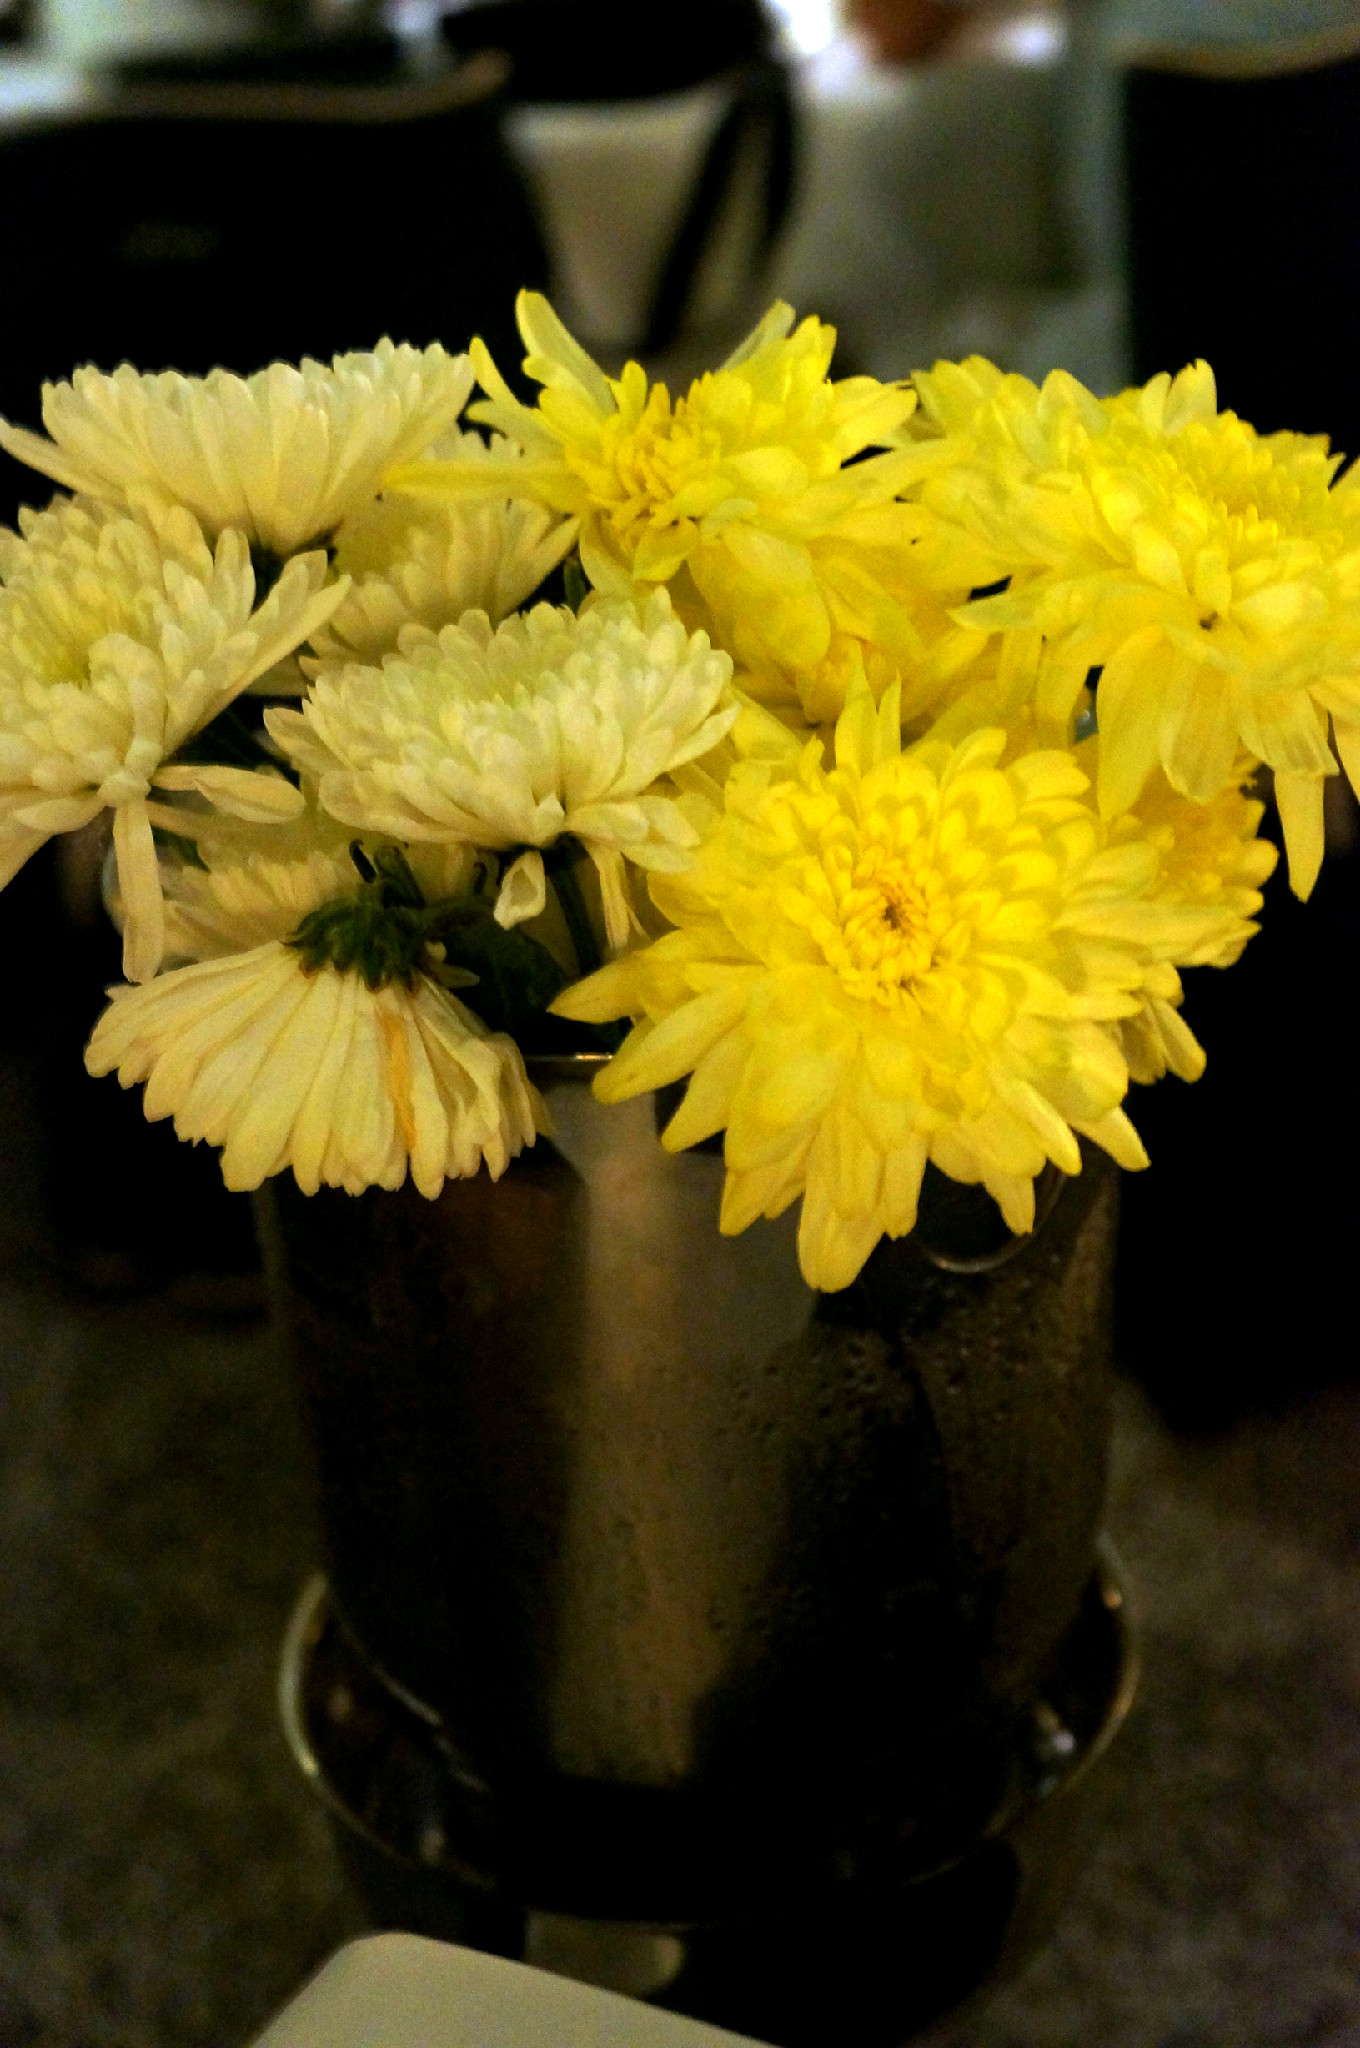 cveće u kibli